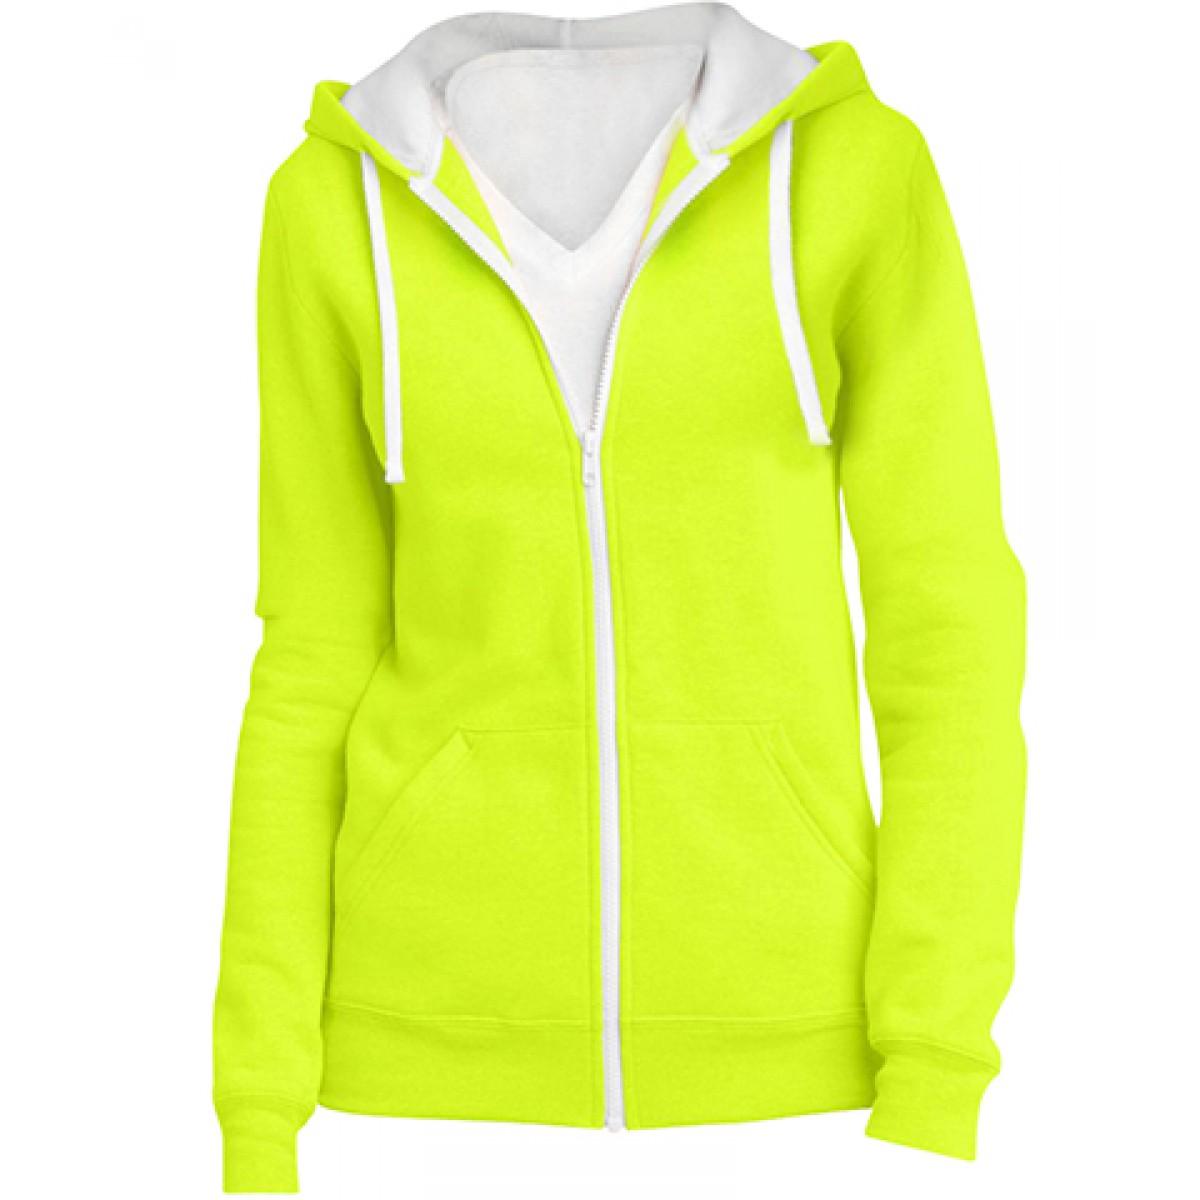 Juniors Full-Zip Hoodie-Safety Green-2XL